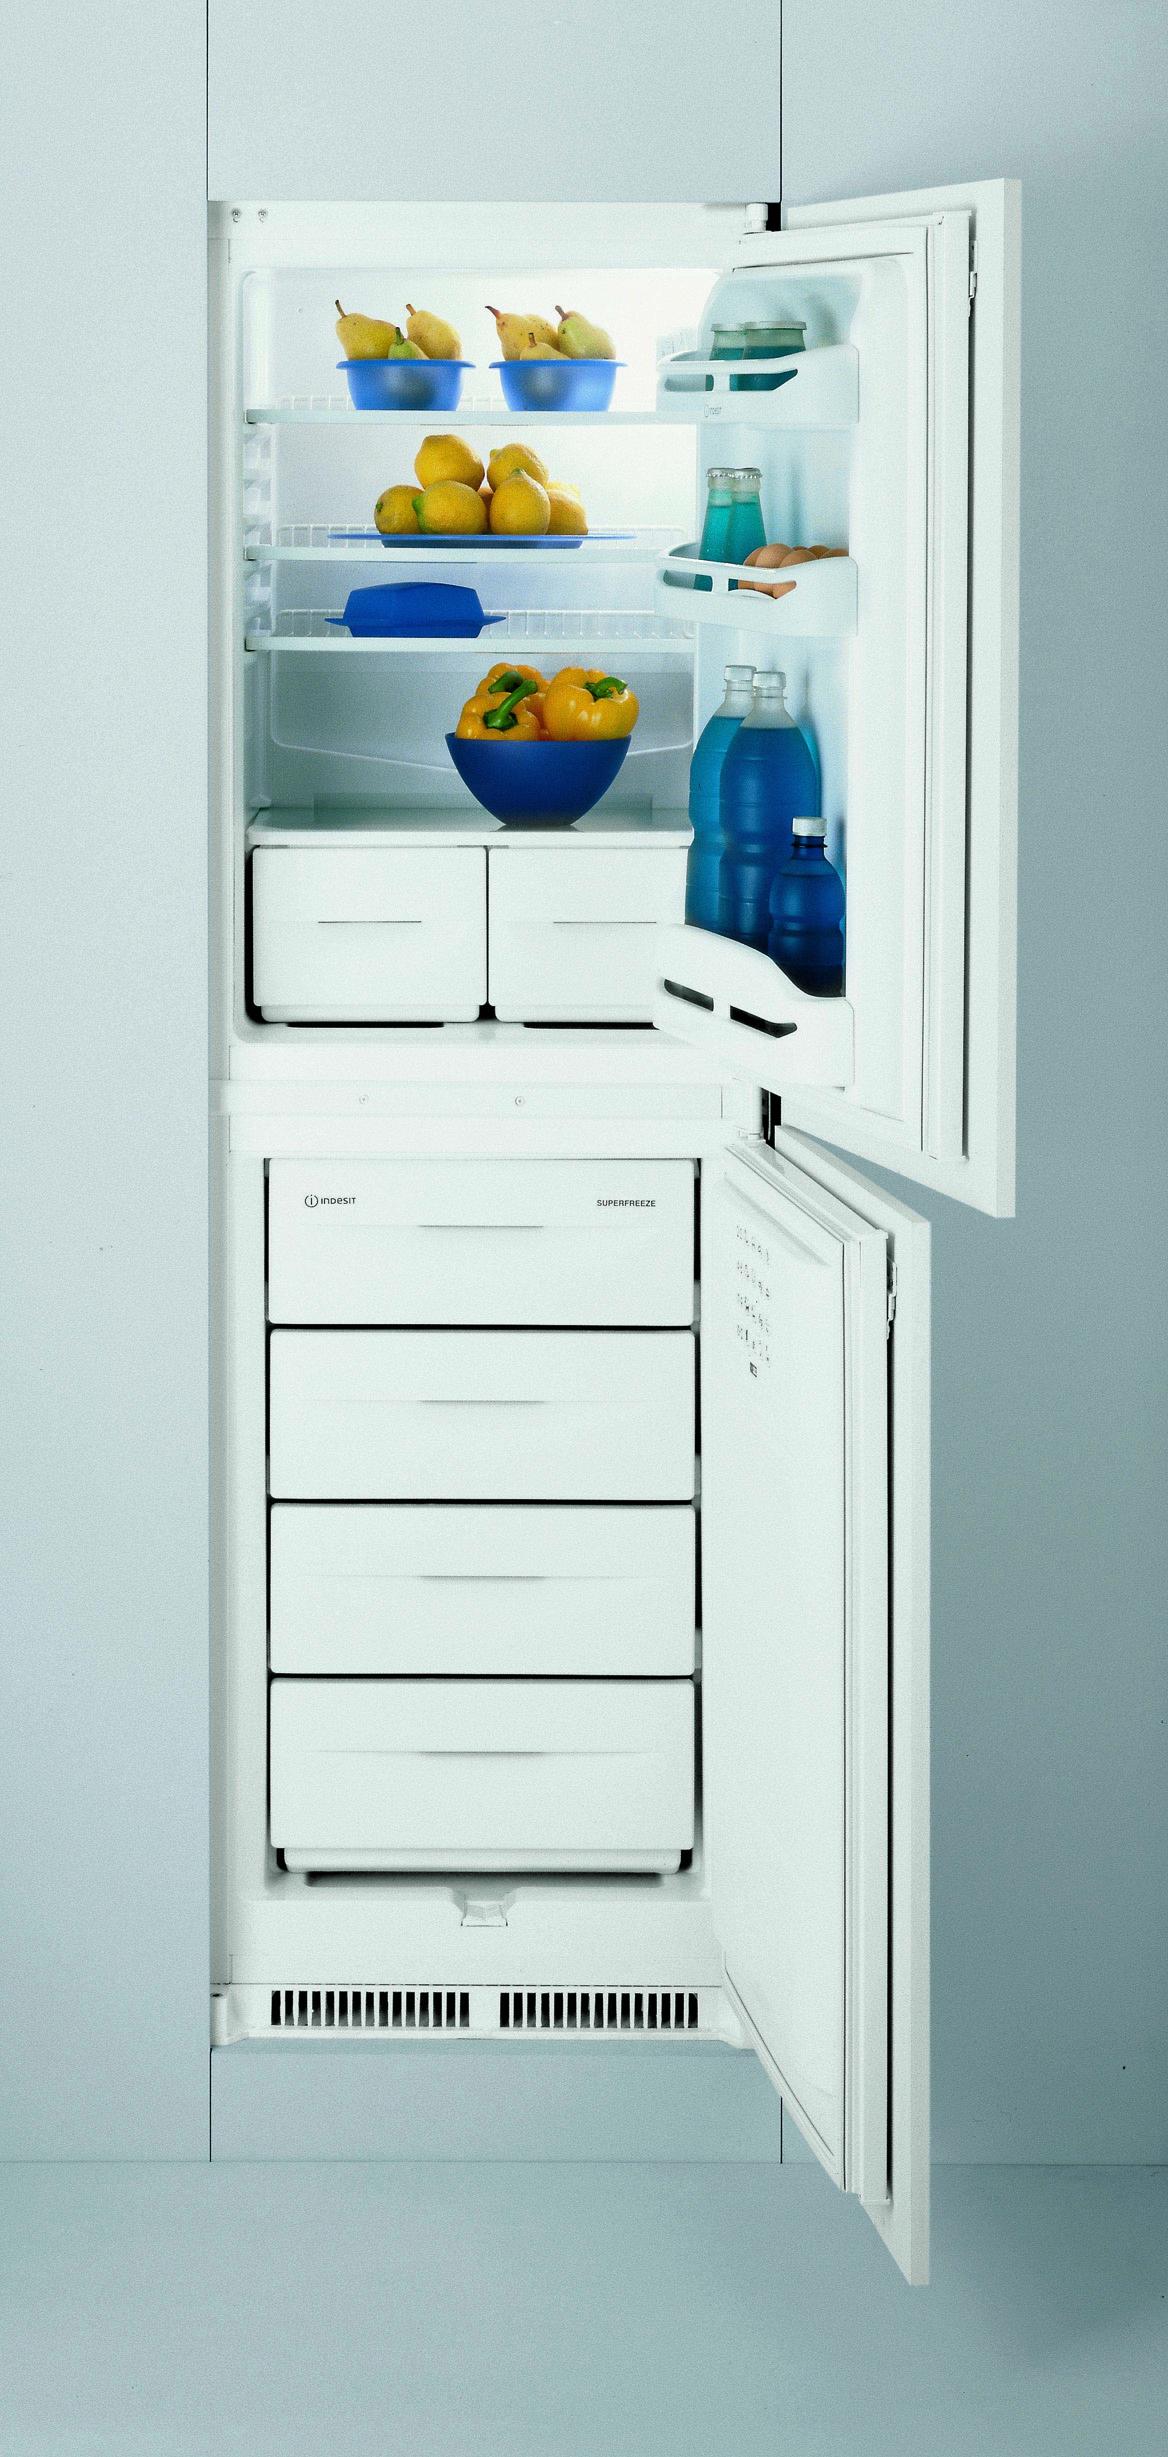 buy fridges and freezers in london indesit indincb31aa4d. Black Bedroom Furniture Sets. Home Design Ideas